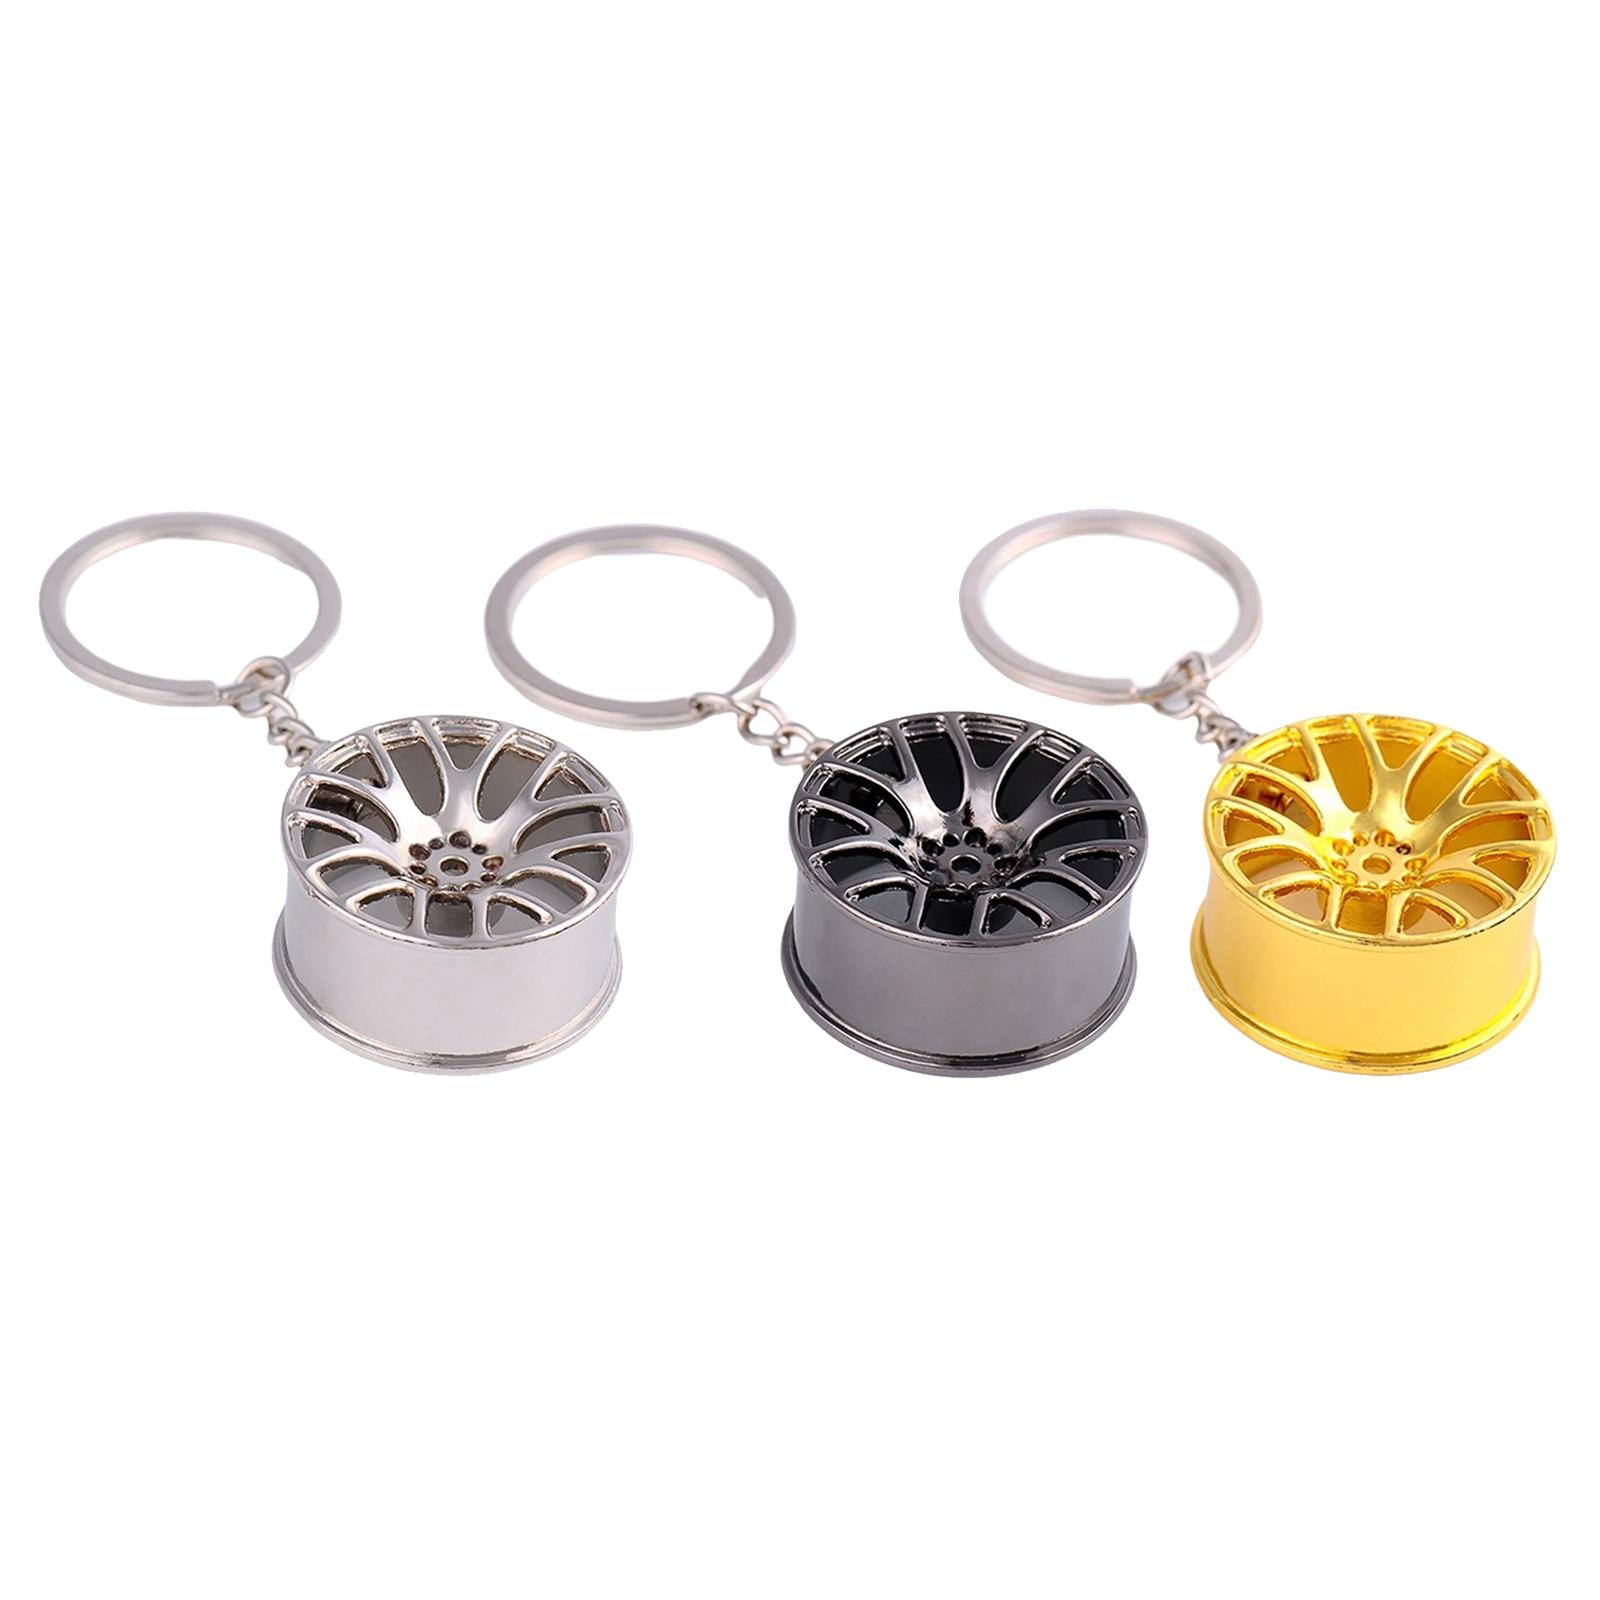 Creative Stylish Metal Wheel Rim Keychain Auto Car Bag Wheel Hubs Keyring Holder Pendant Charm Decor Ornament Gift